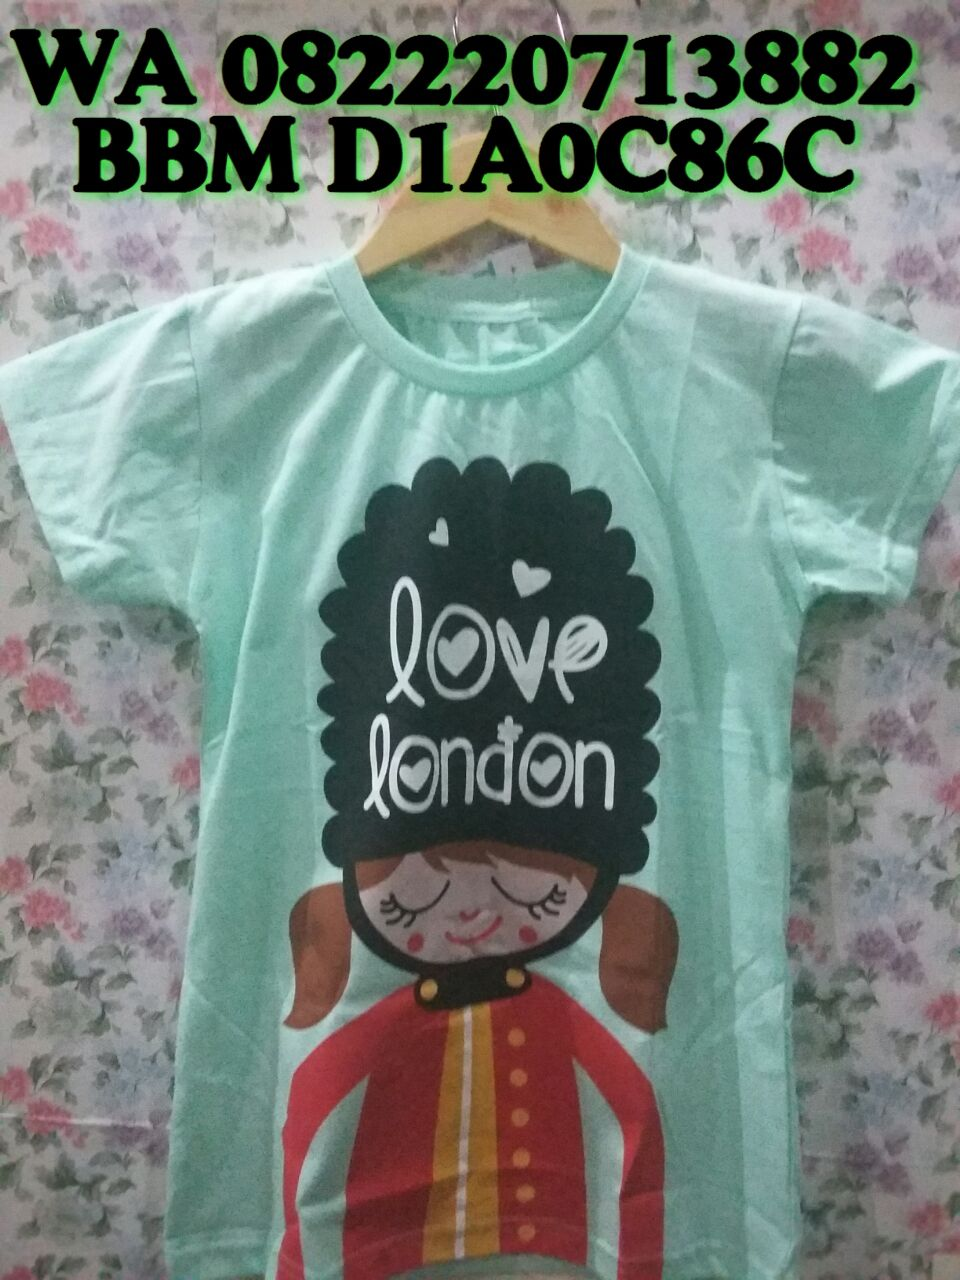 Kaos Baju Anak Bayi Laki Perempuan Murah Lucu Bagus Branded 1 2 3 4 5 Tahun Pembelian Silahkan Hubungi Admin Wa 082220713882 Bbm D Baju Anak Anak Kaos